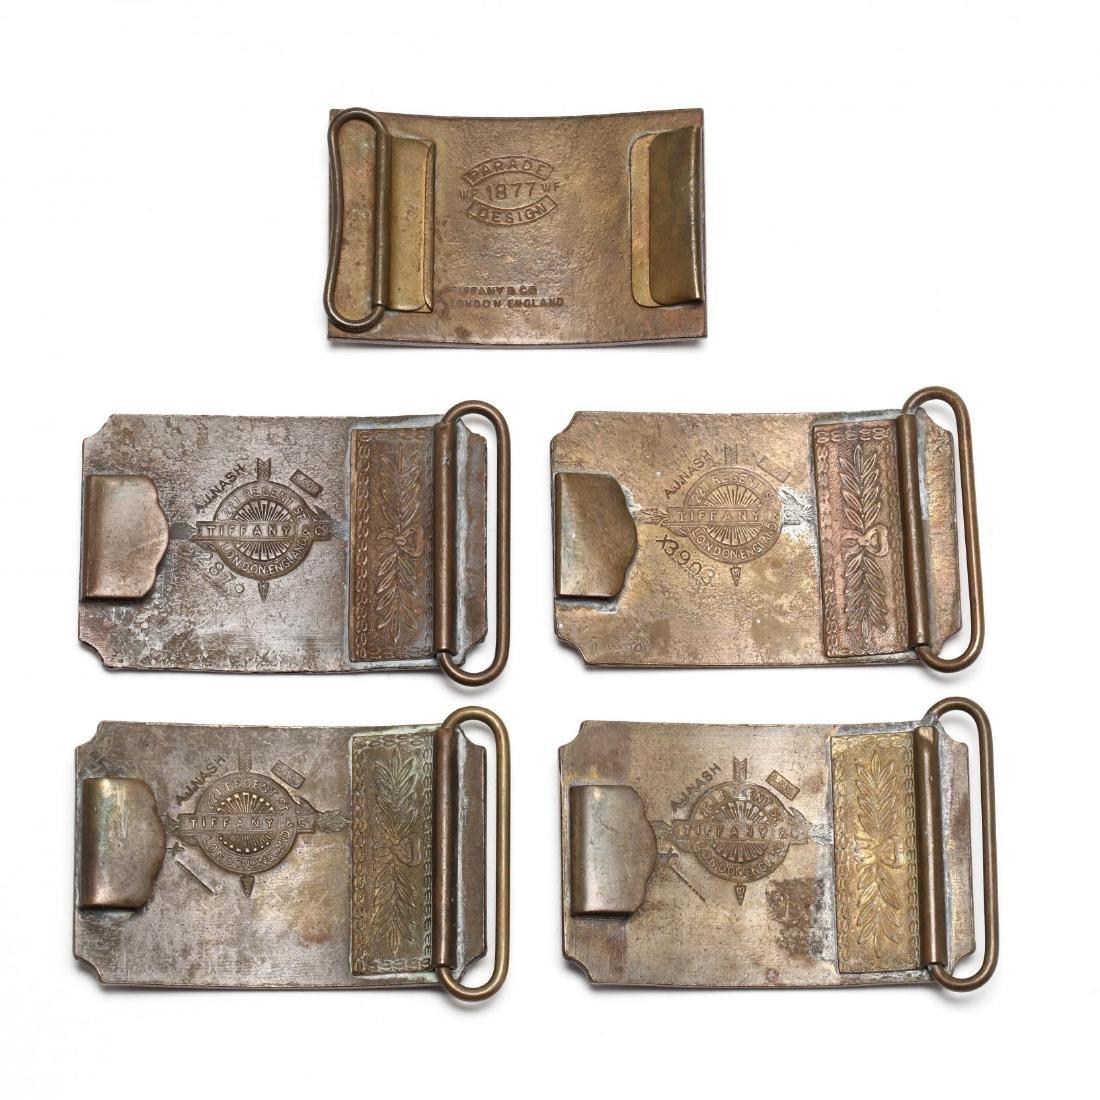 Five Vintage Tiffany Belt Buckles for Wells Fargo & - 2